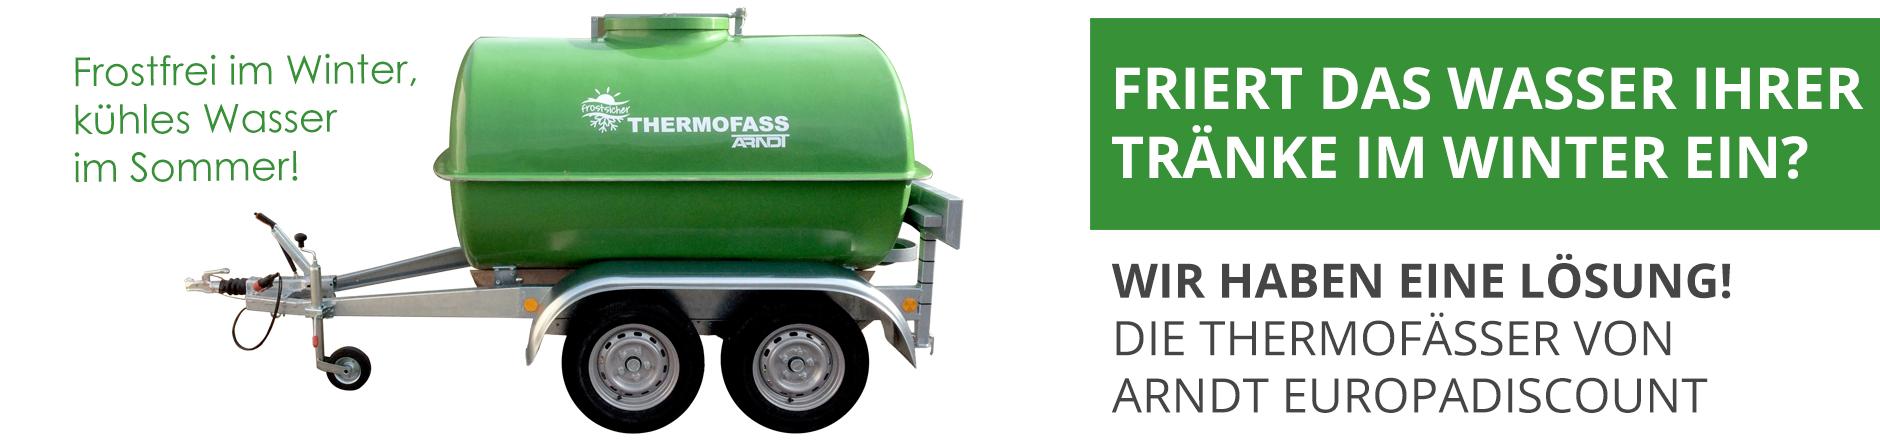 Thermofass 1430 Liter frostfrei